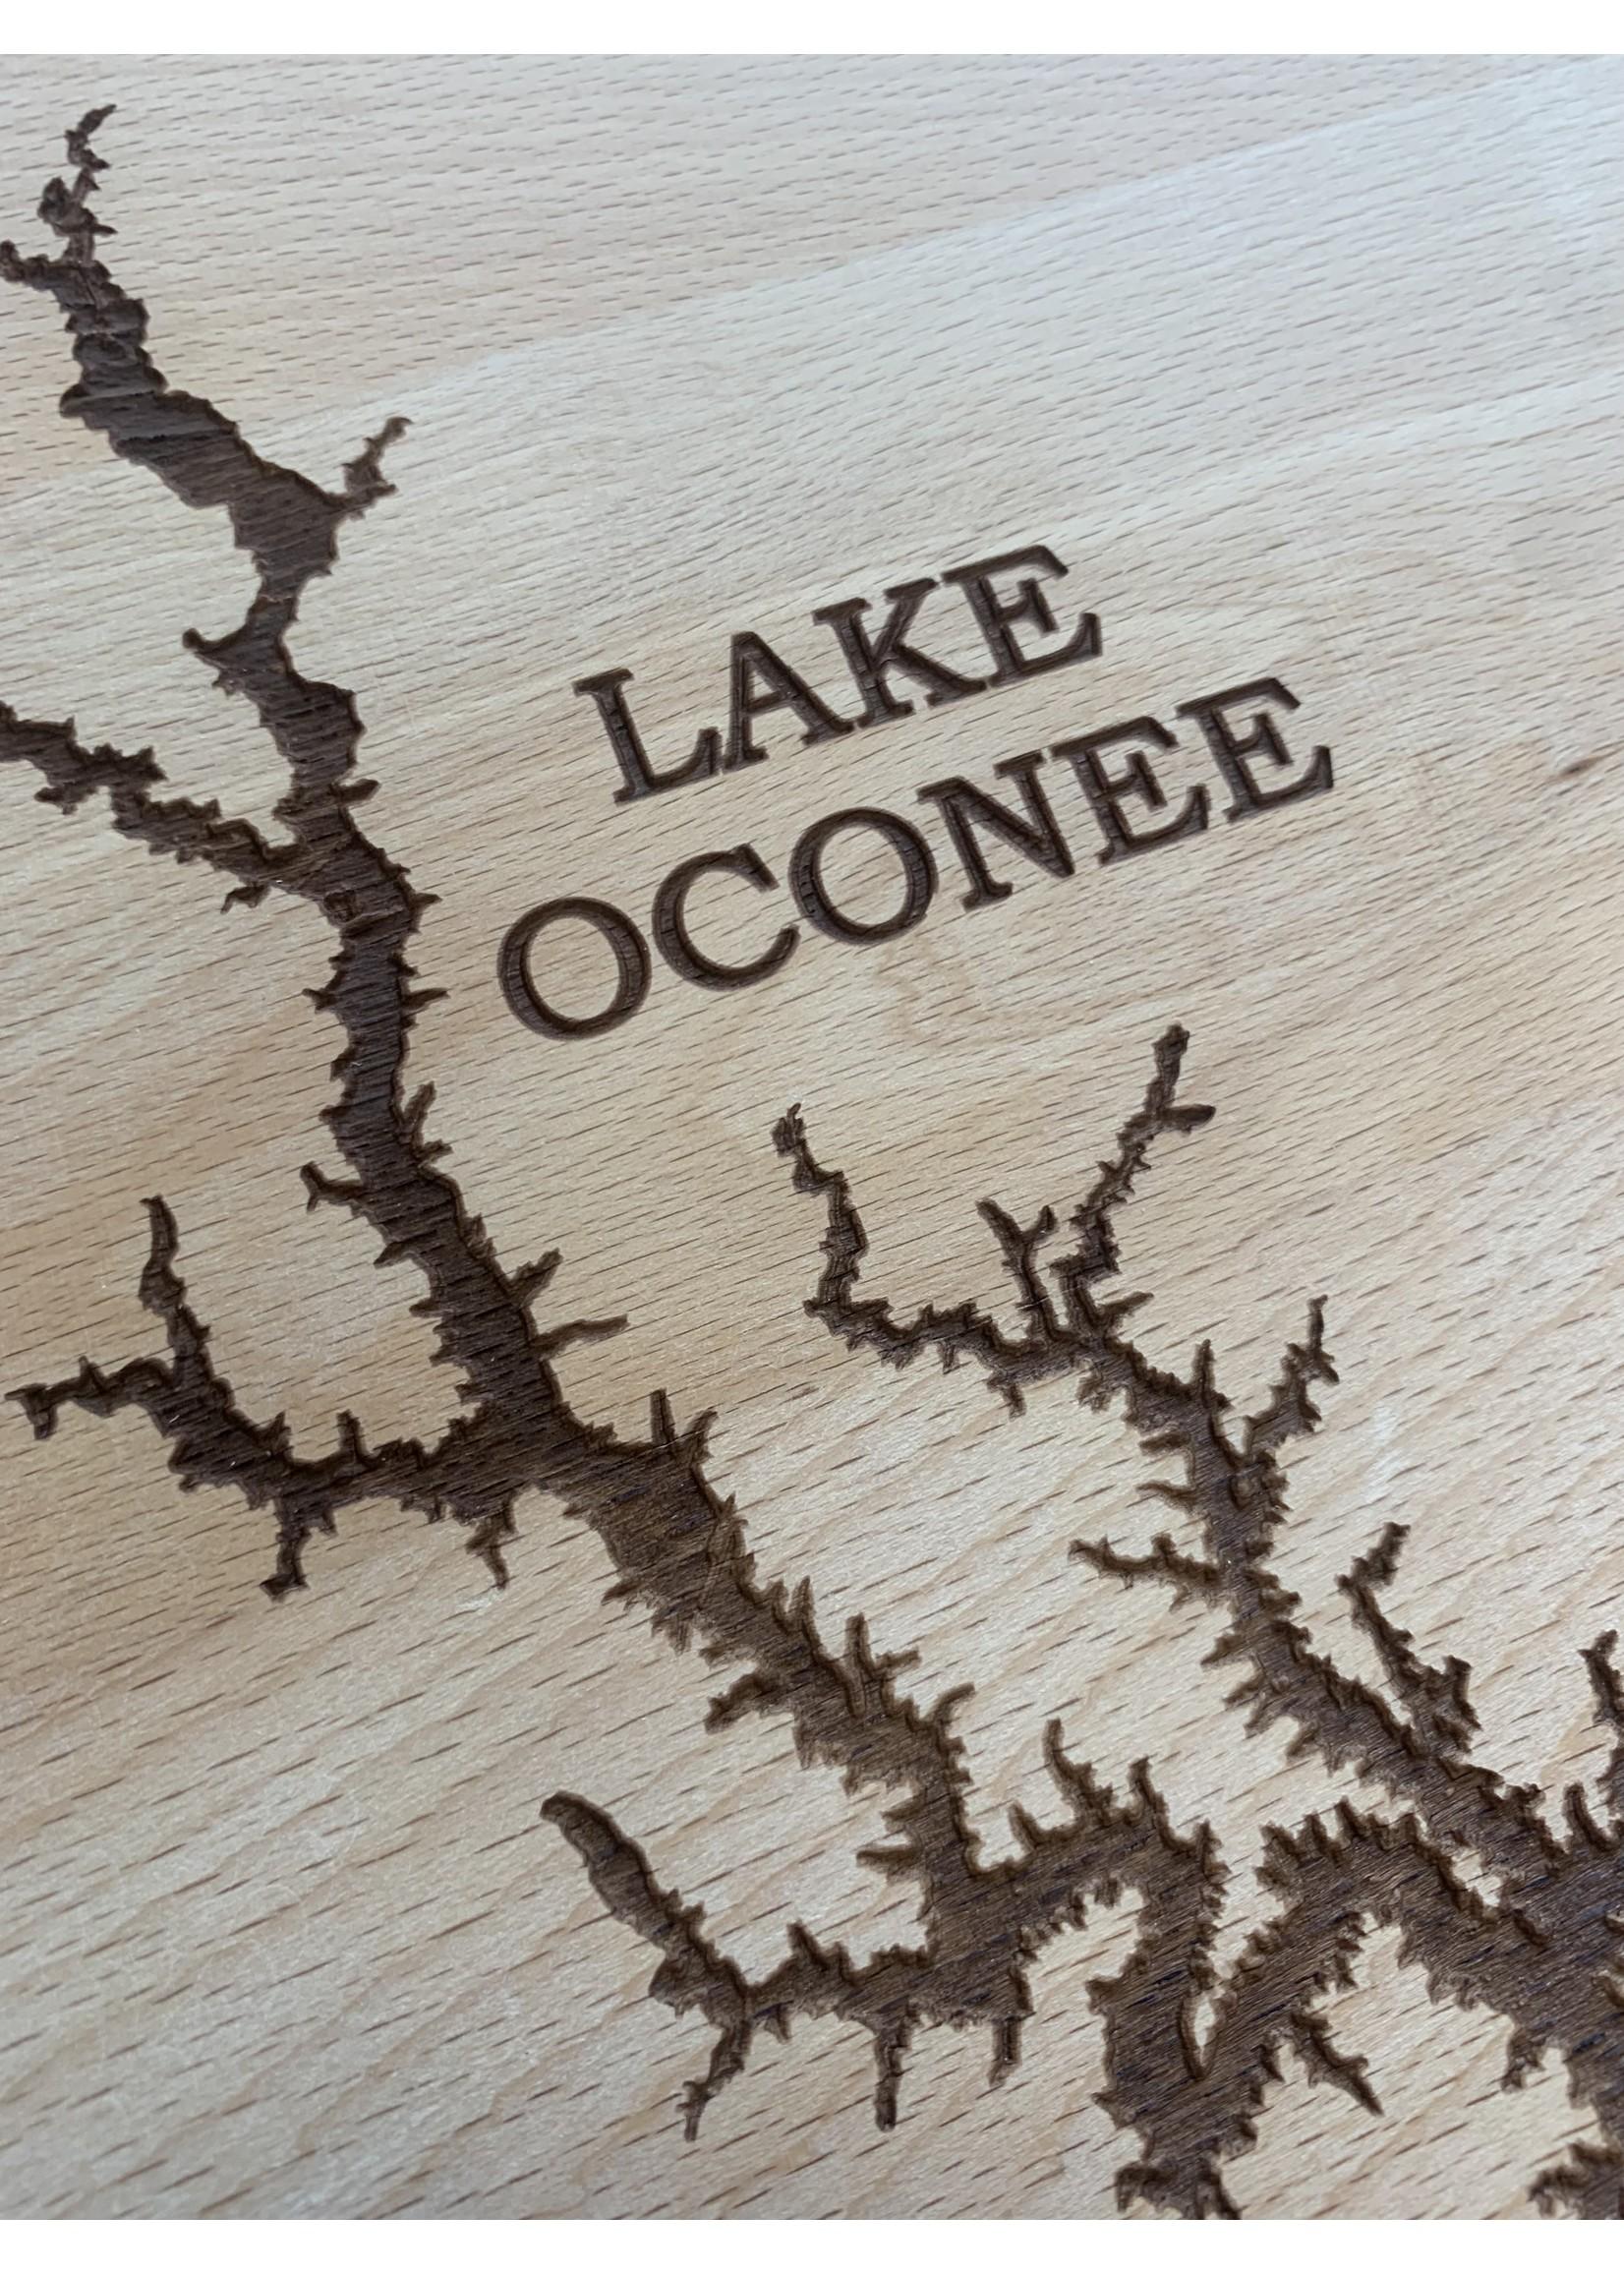 birch and boulder Lake Oconee Wood Board